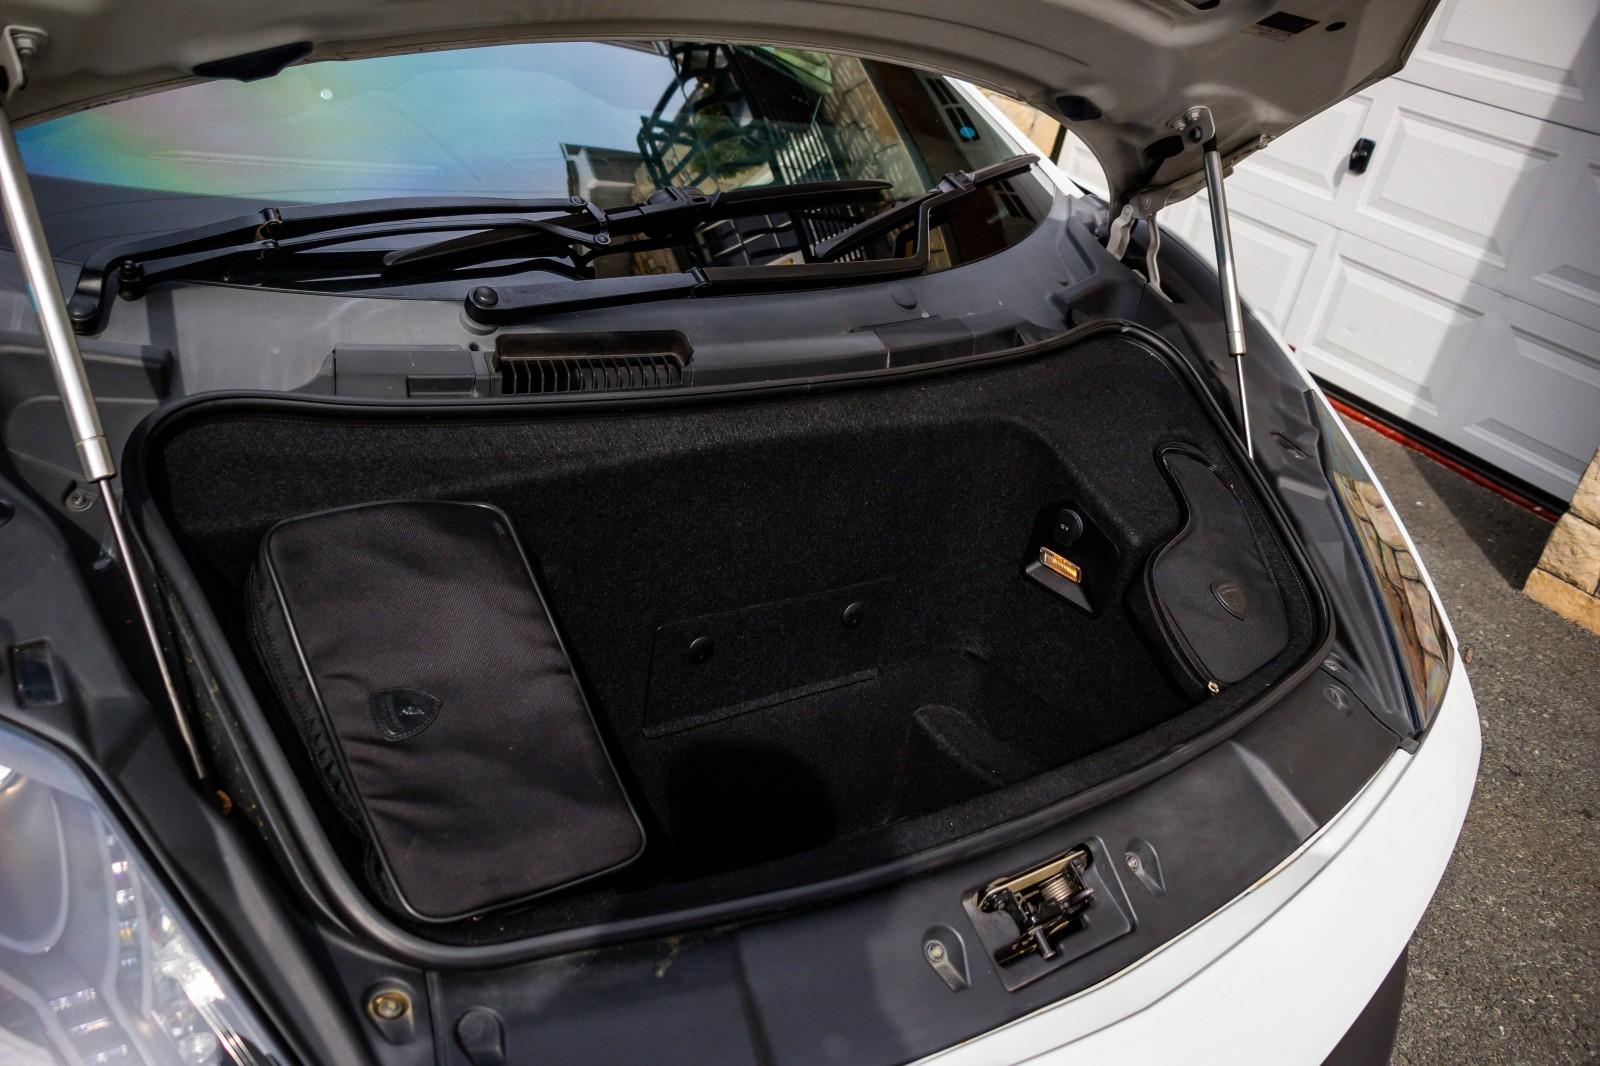 2011 Lamborghini Gallardo LP550-2 SINGAPORE LIMITED EDITION 05/10 Petrol Automatic – Morgan Cars 9 Mound Road, Warrenpoint, Newry BT34 3LW, UK full